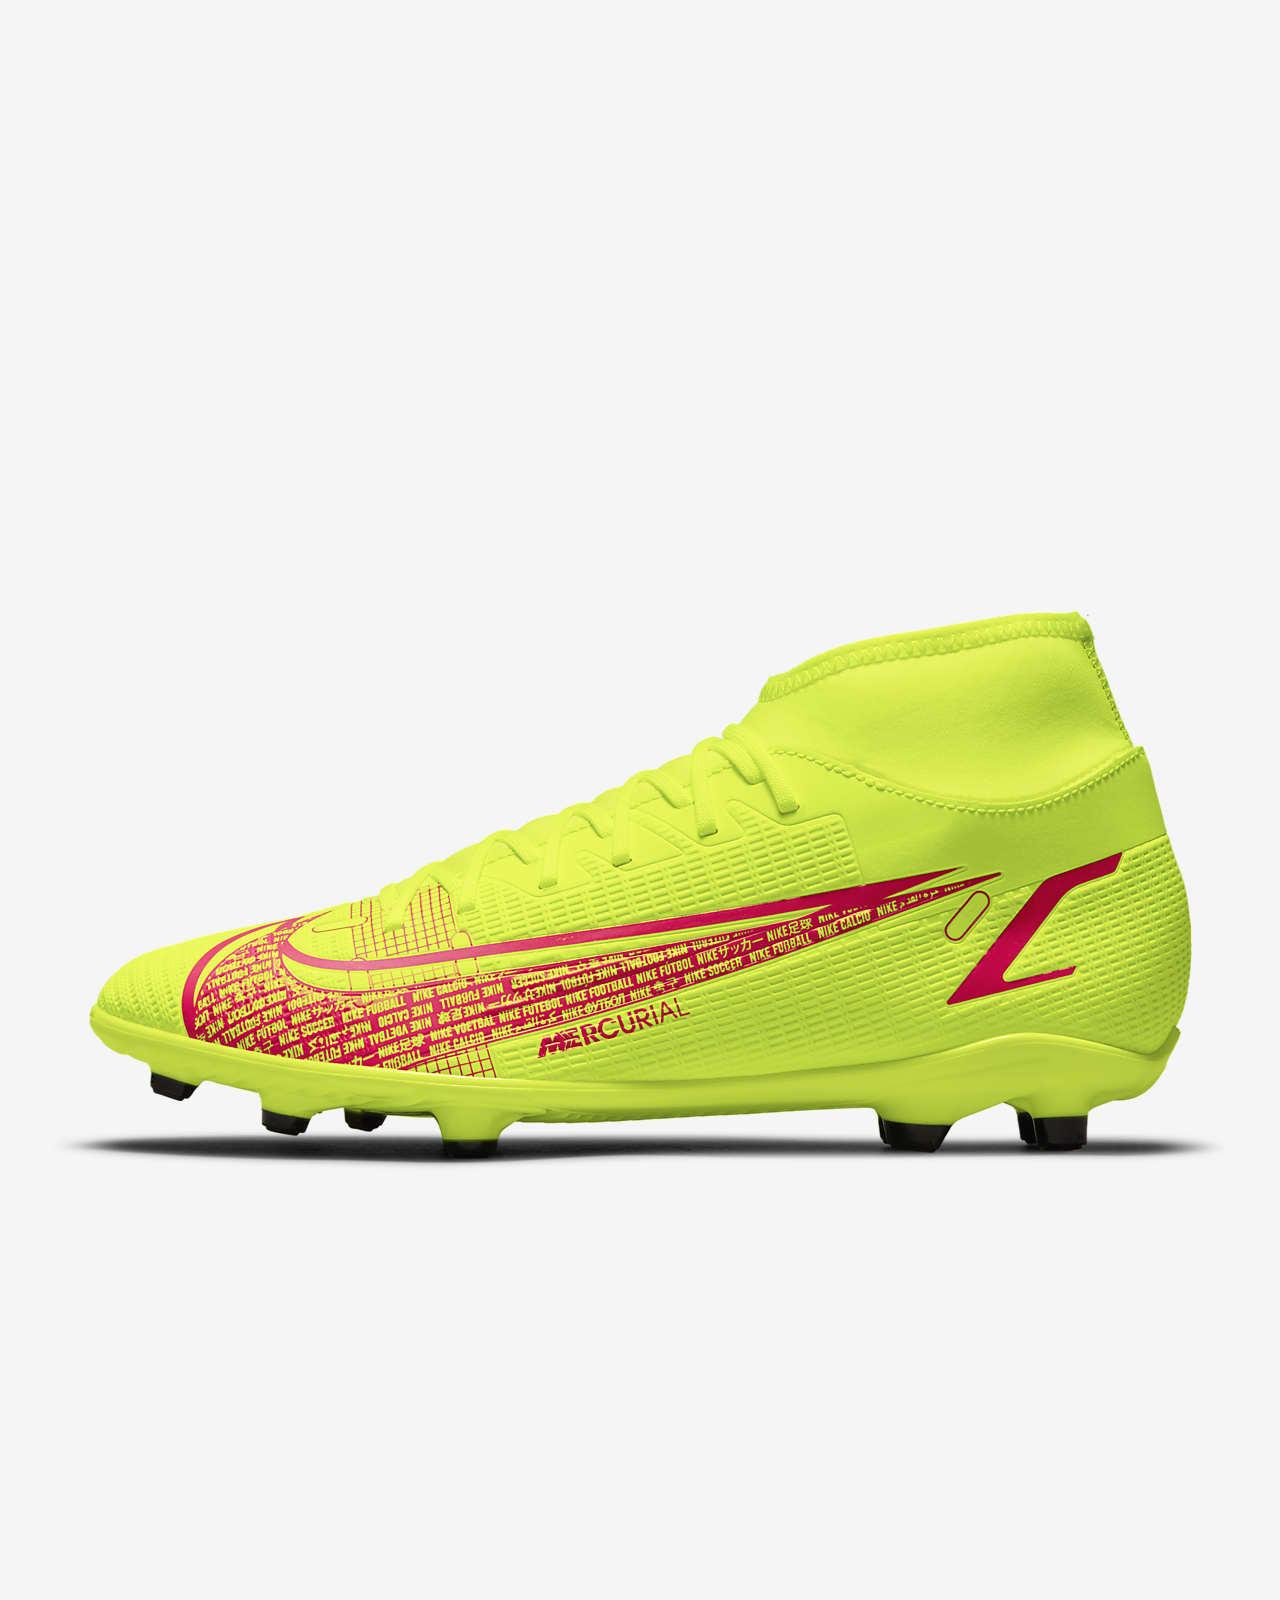 Nike Mercurial Superfly 8 Club MG Multi-Ground Football Boot